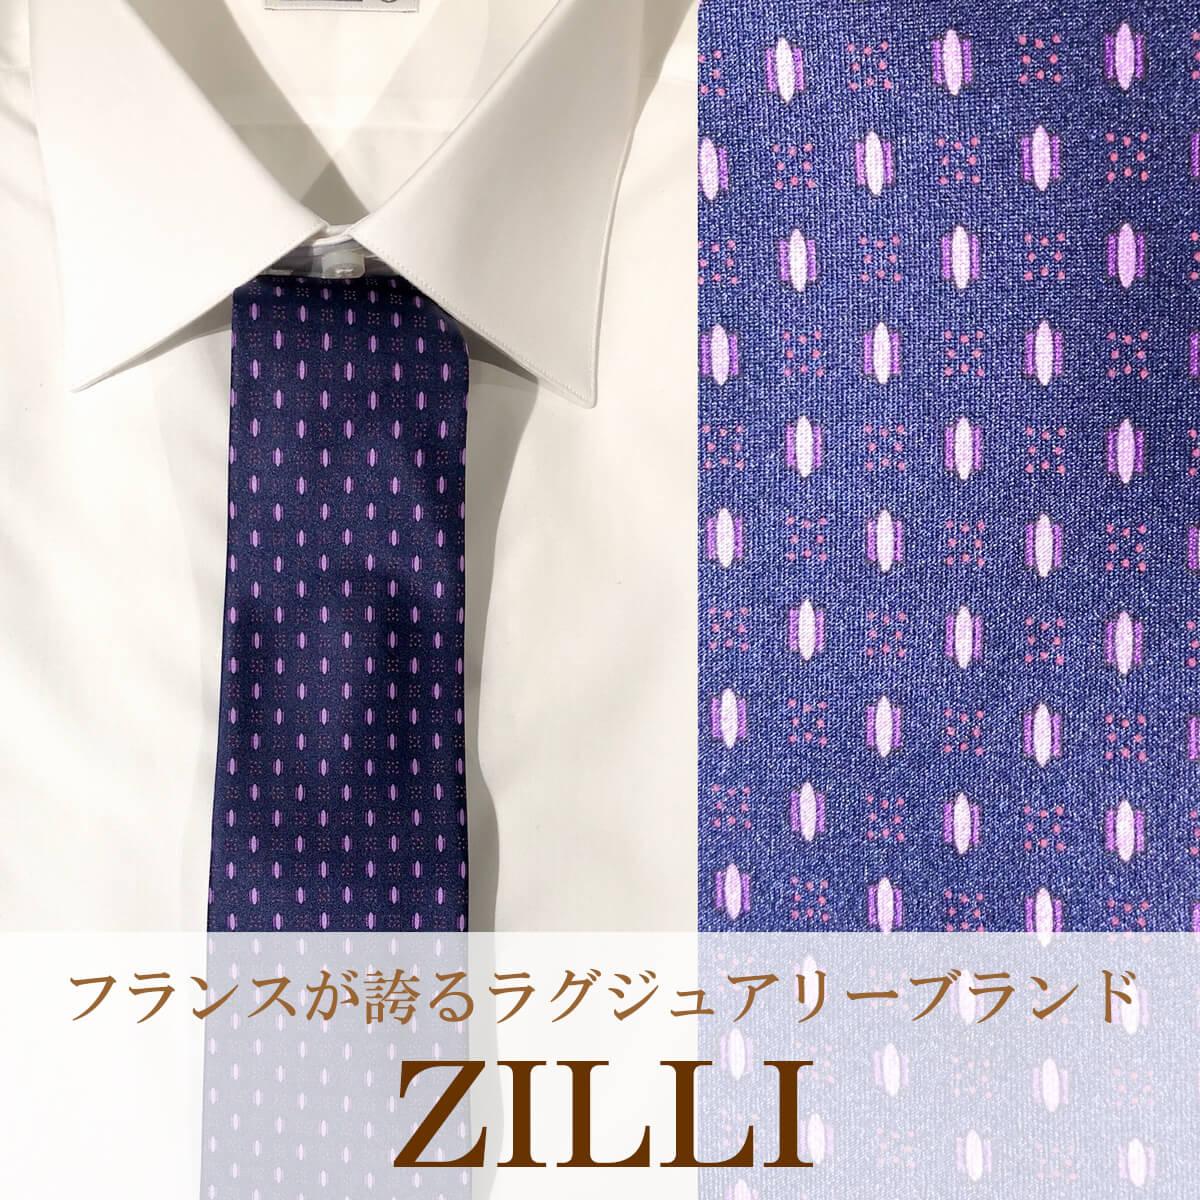 ZILLI (ジリー)ネクタイ ブランド 高級 ジリー ZILLI シルク プリント セブンフォールド 結婚式 パーティー おしゃれ